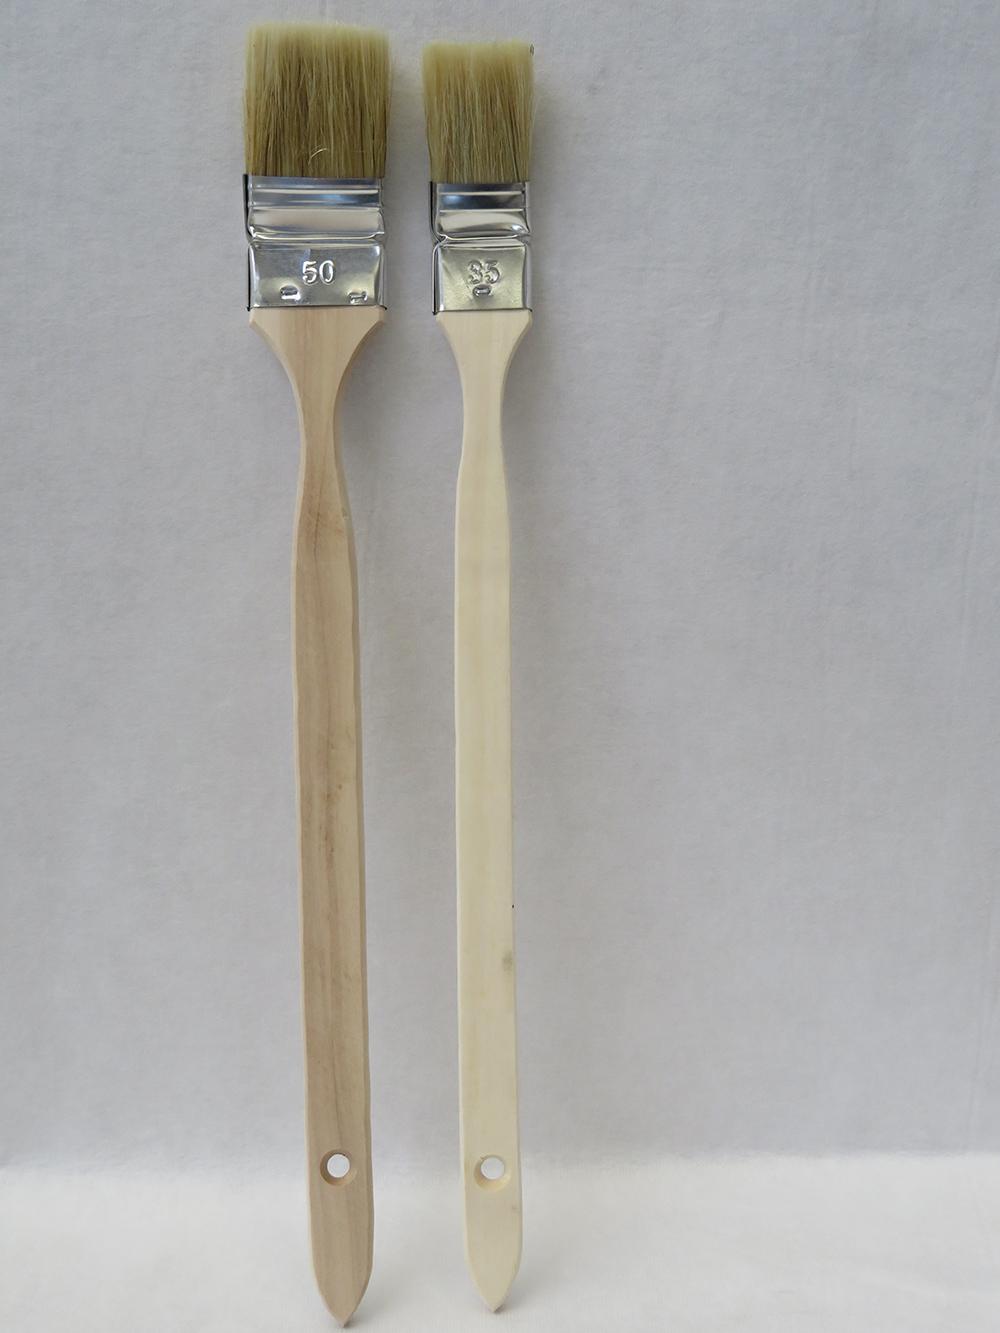 Pinsel Heizkörper lang Breite 35mm